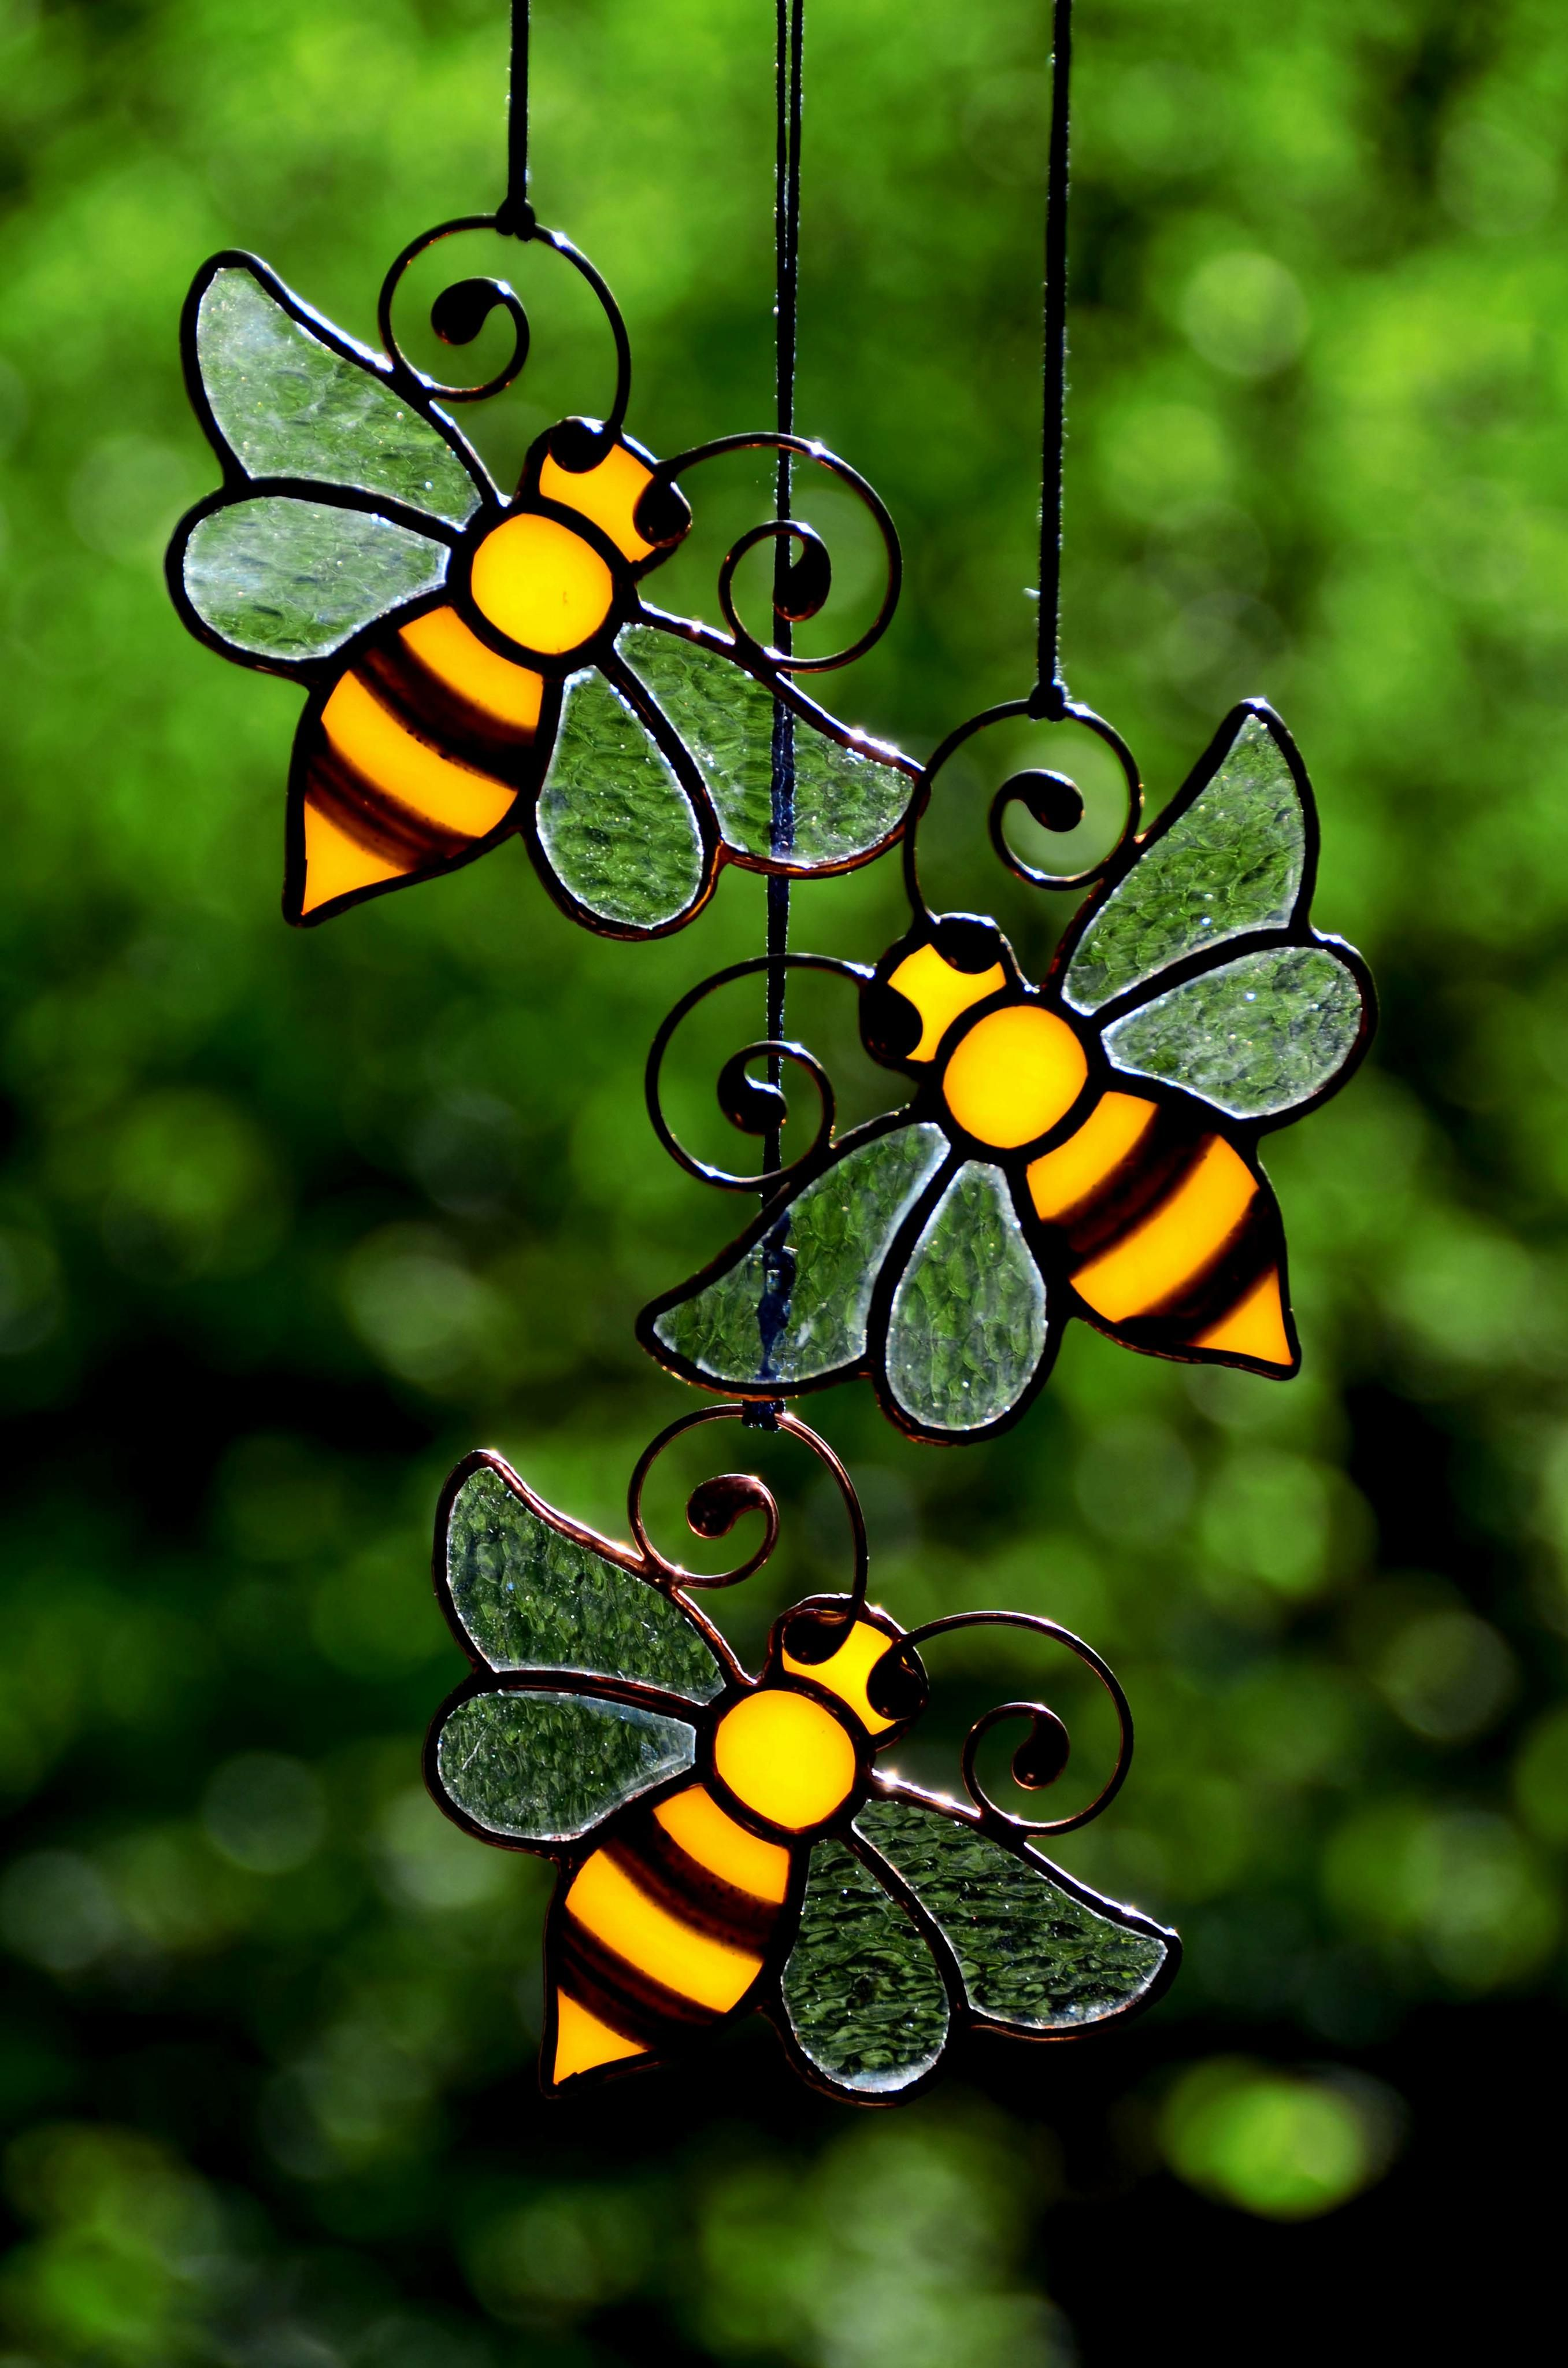 Honey Bee Decor Stained Glass Bee Suncatcher Garden Decoration Beekeeper Gift Windows Dec Stained Glass Suncatchers Honey Bee Decor Stained Glass Ornaments